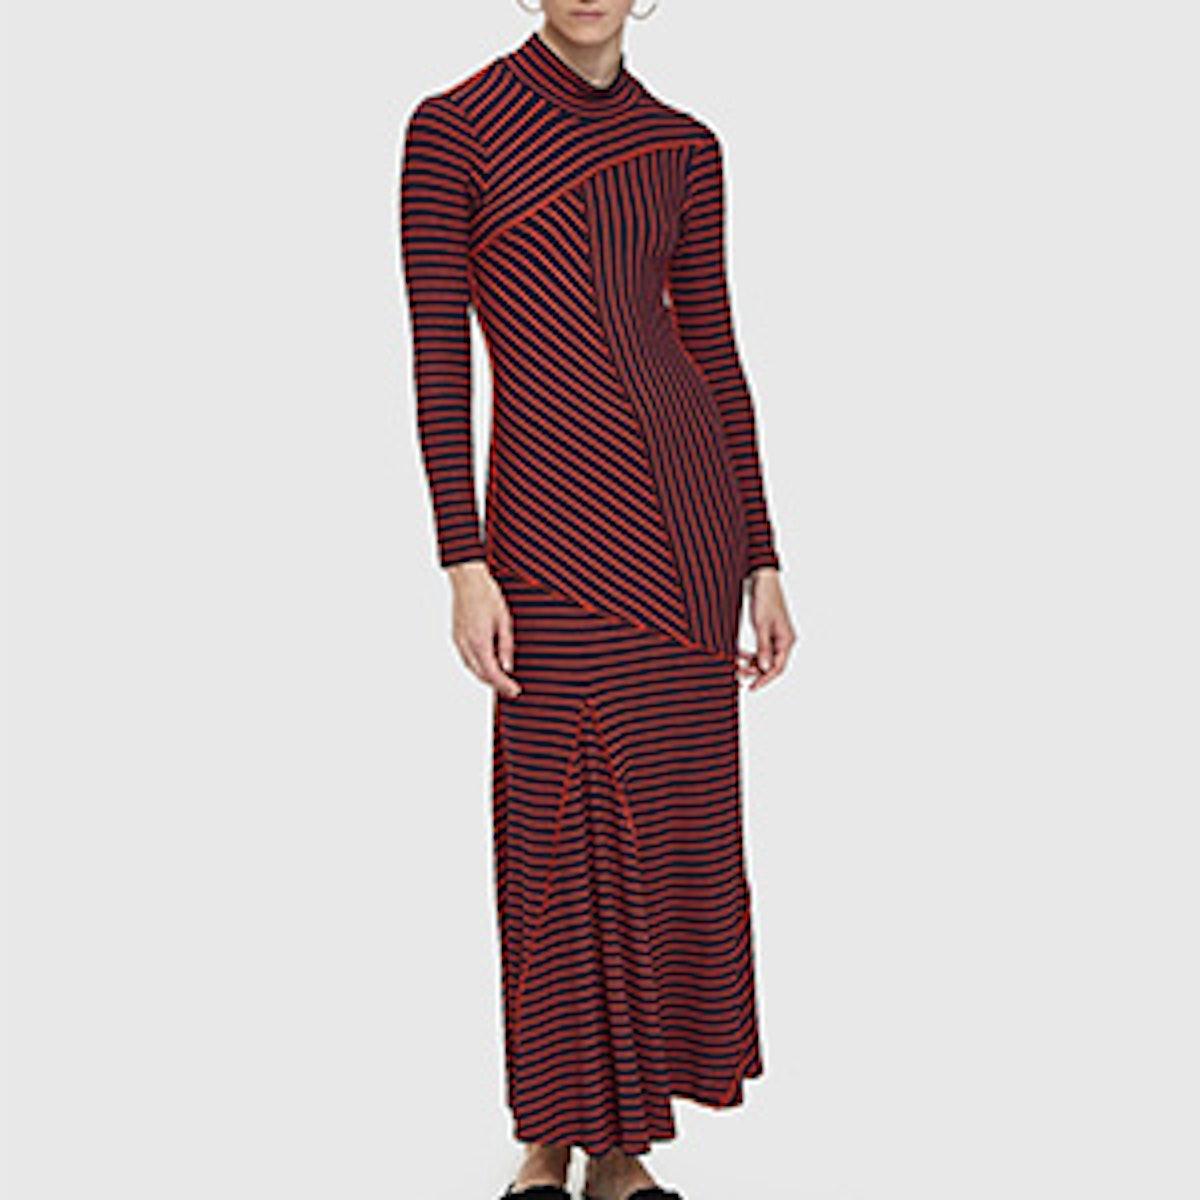 Toppa Leisure Stripe Dress